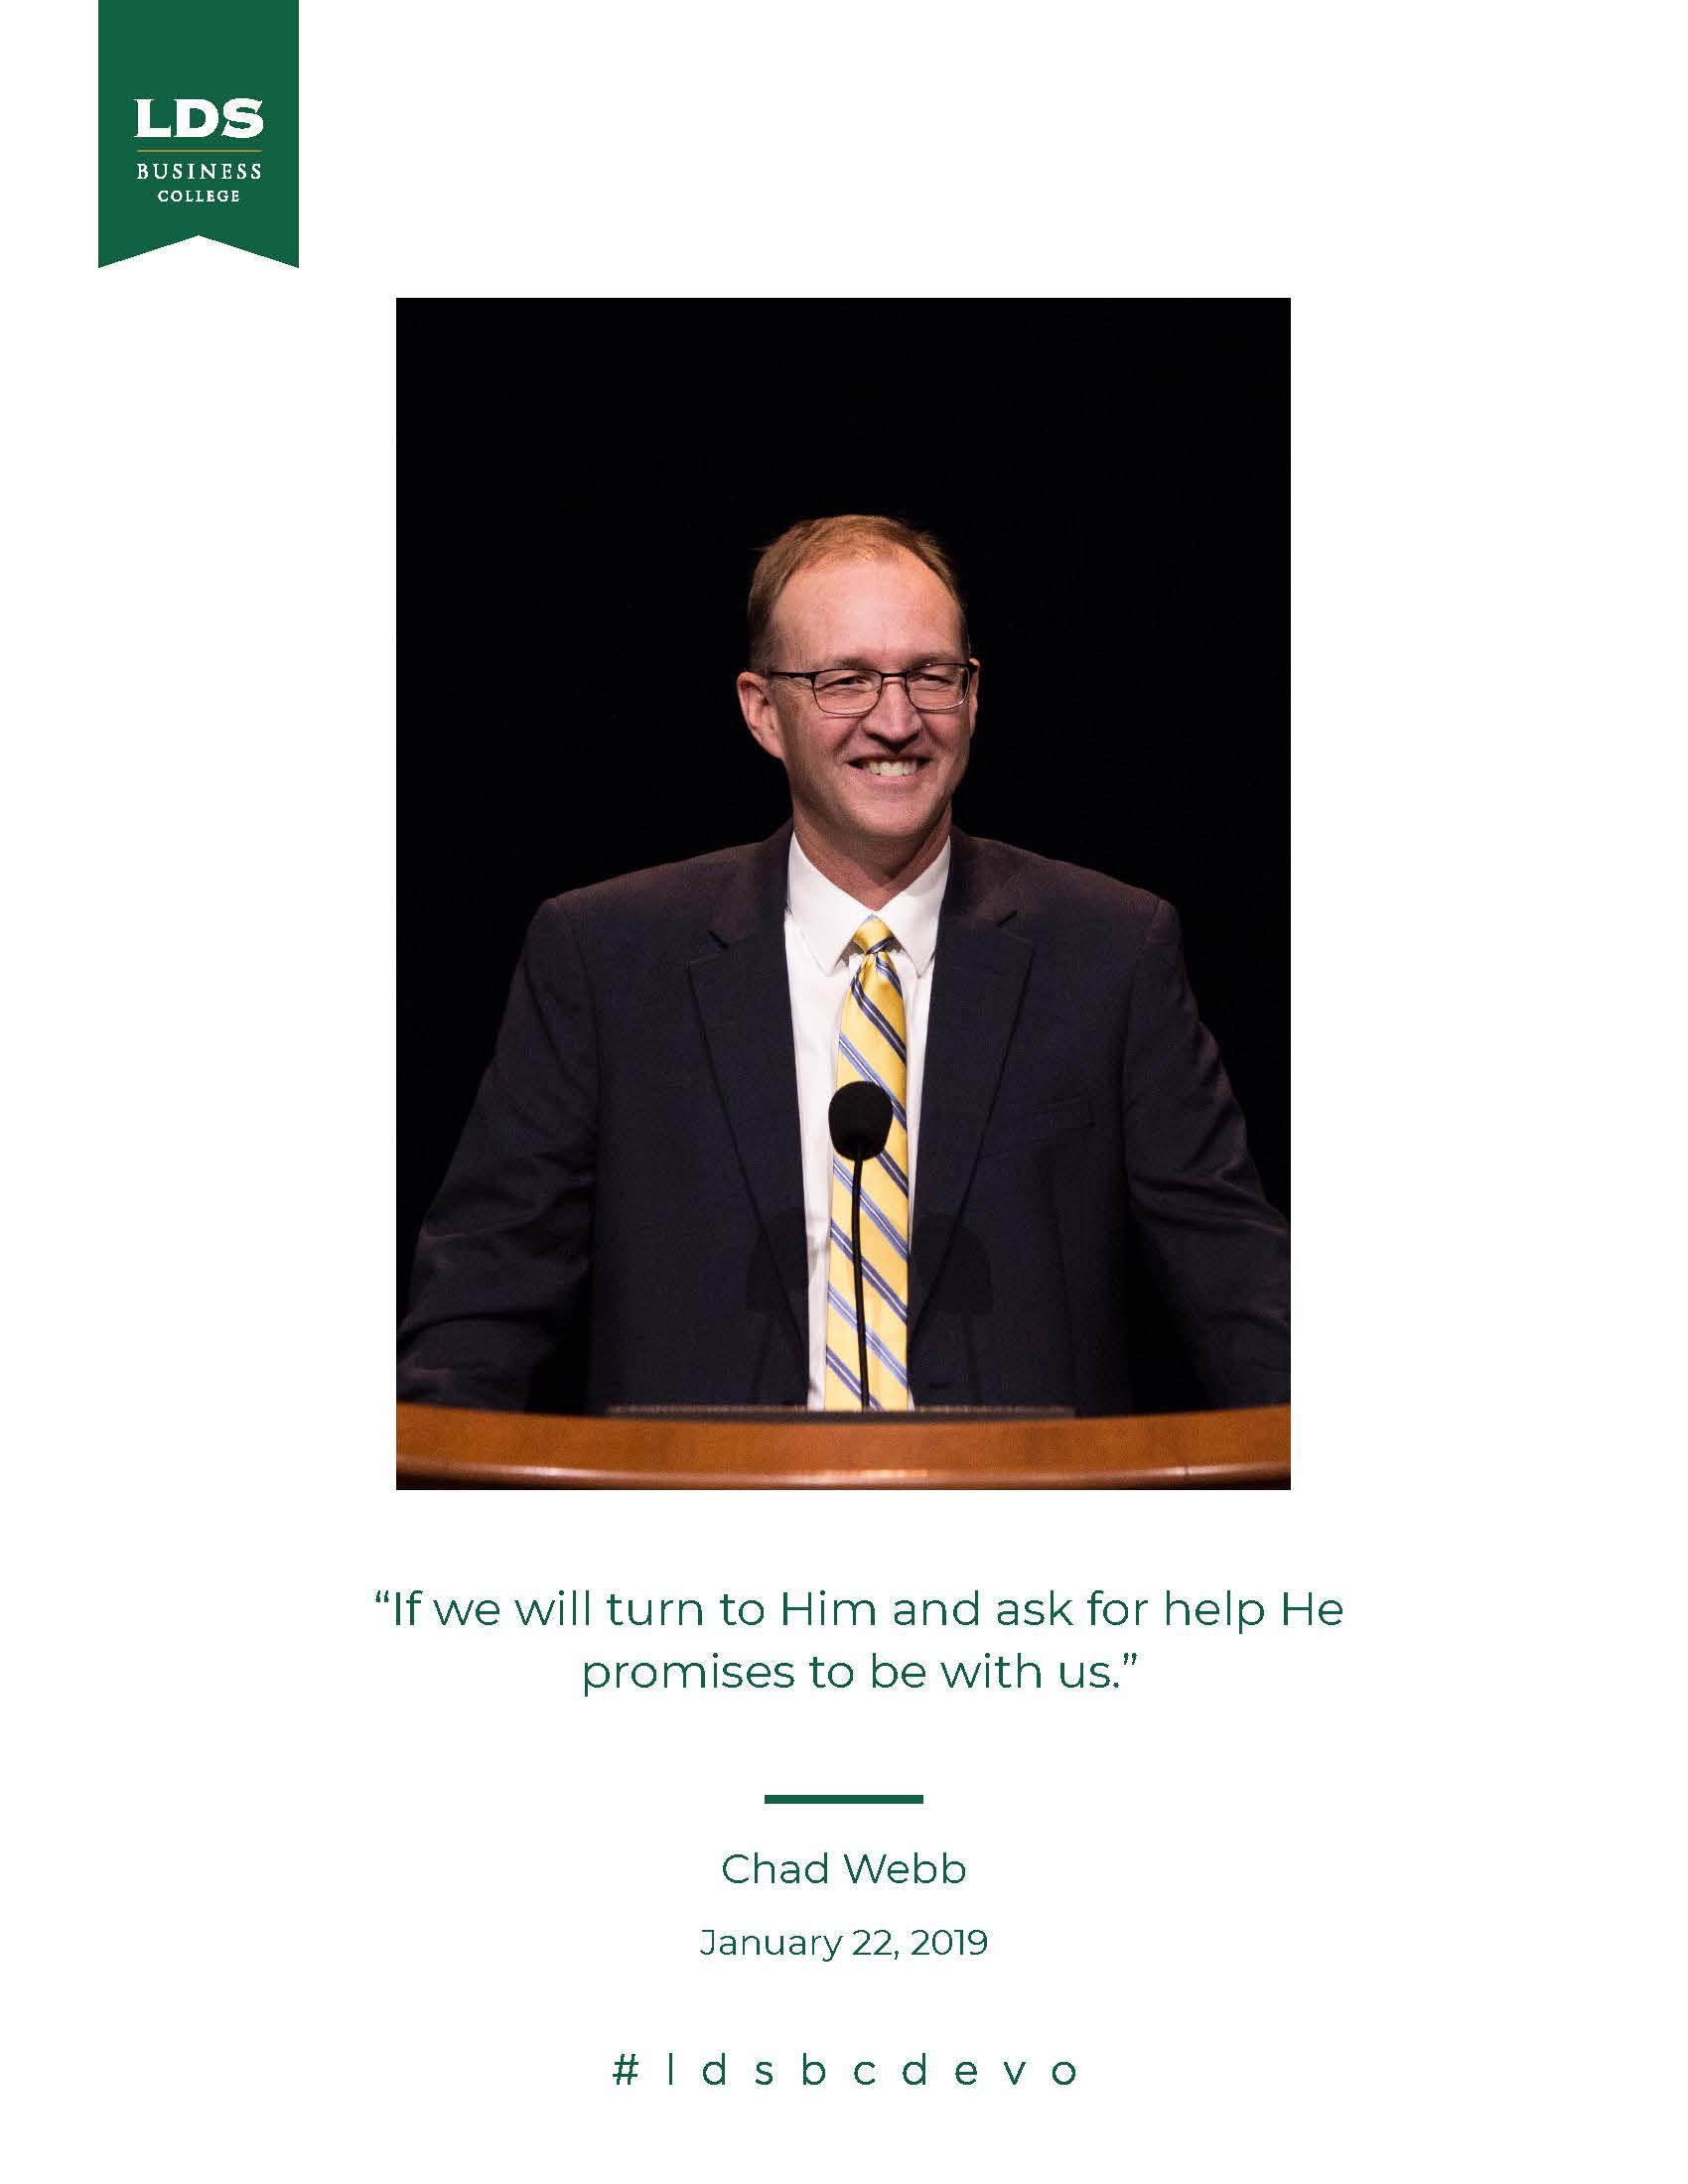 Chad Webb quote